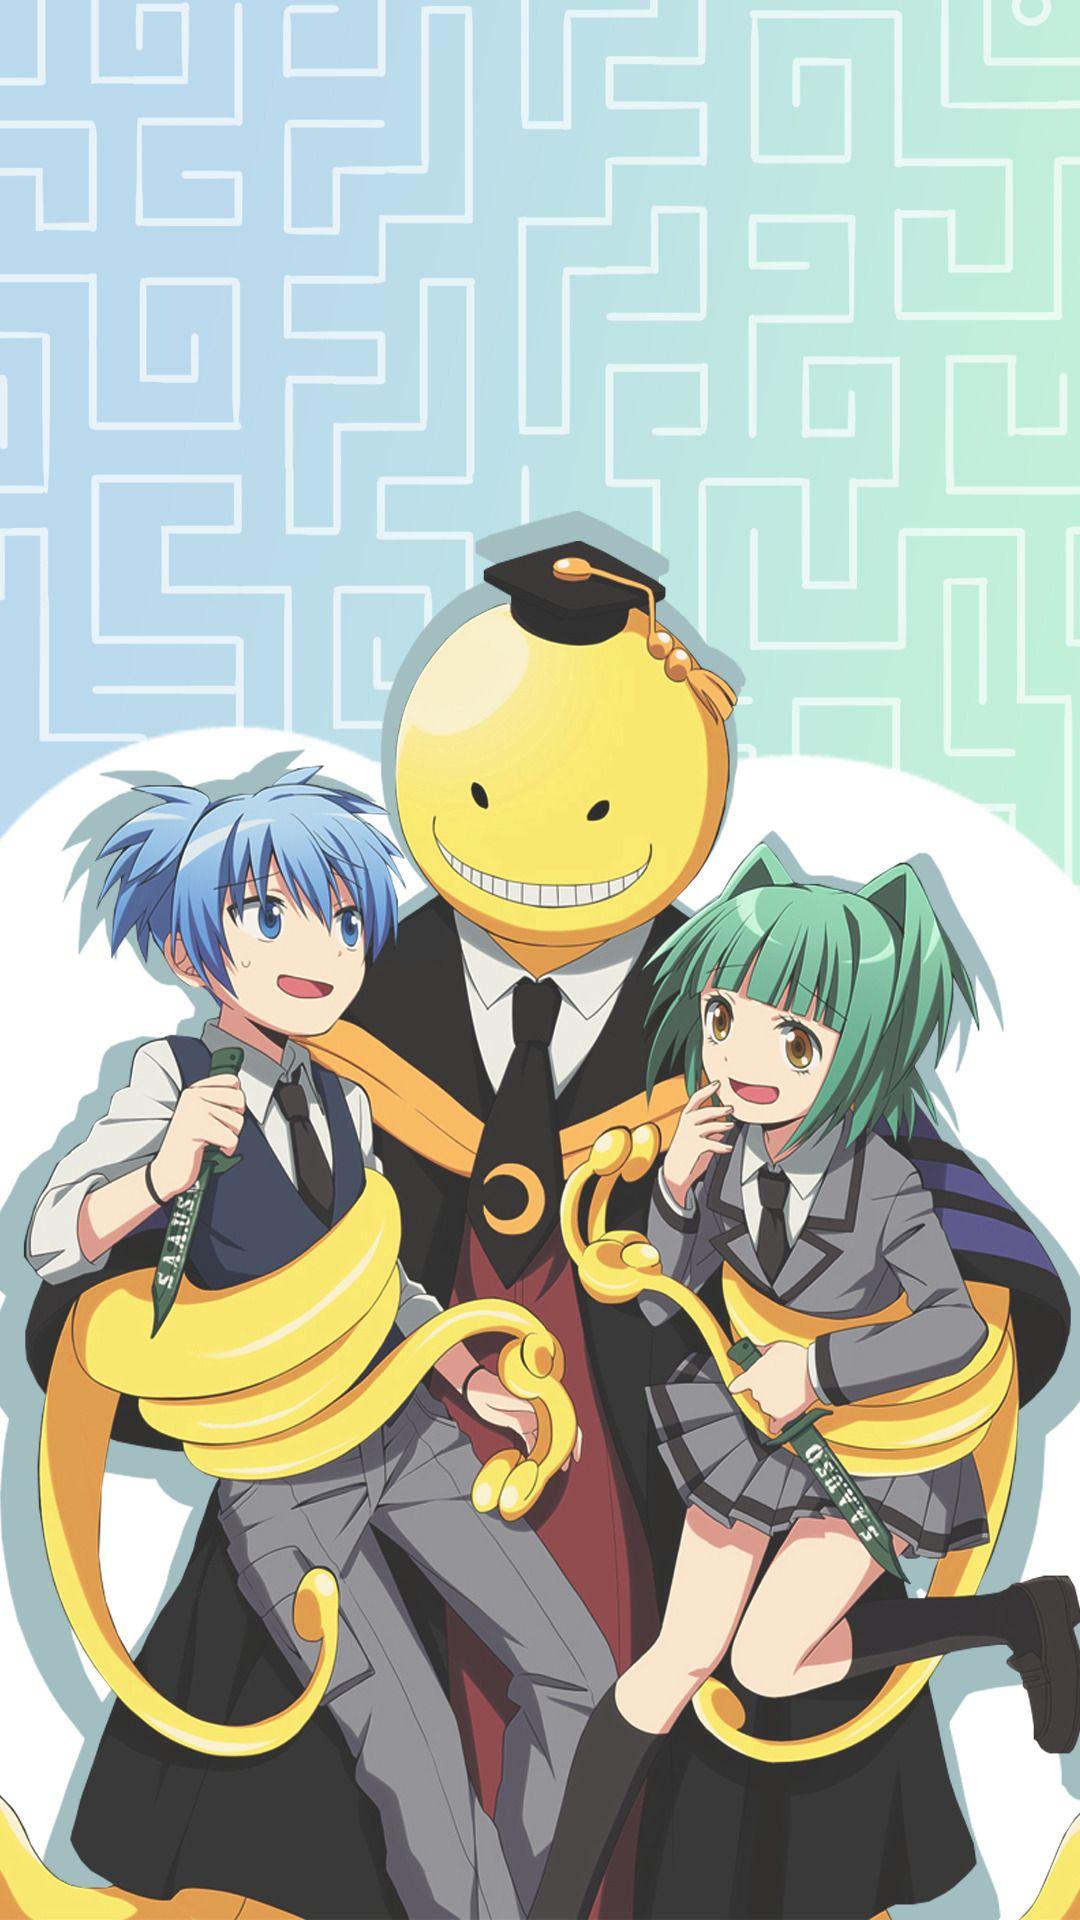 Wallpapers And Lockscreen Assassination Classroom Ansatsu Kyoushitsu Assassination Classroom Assasination Classroom Anime